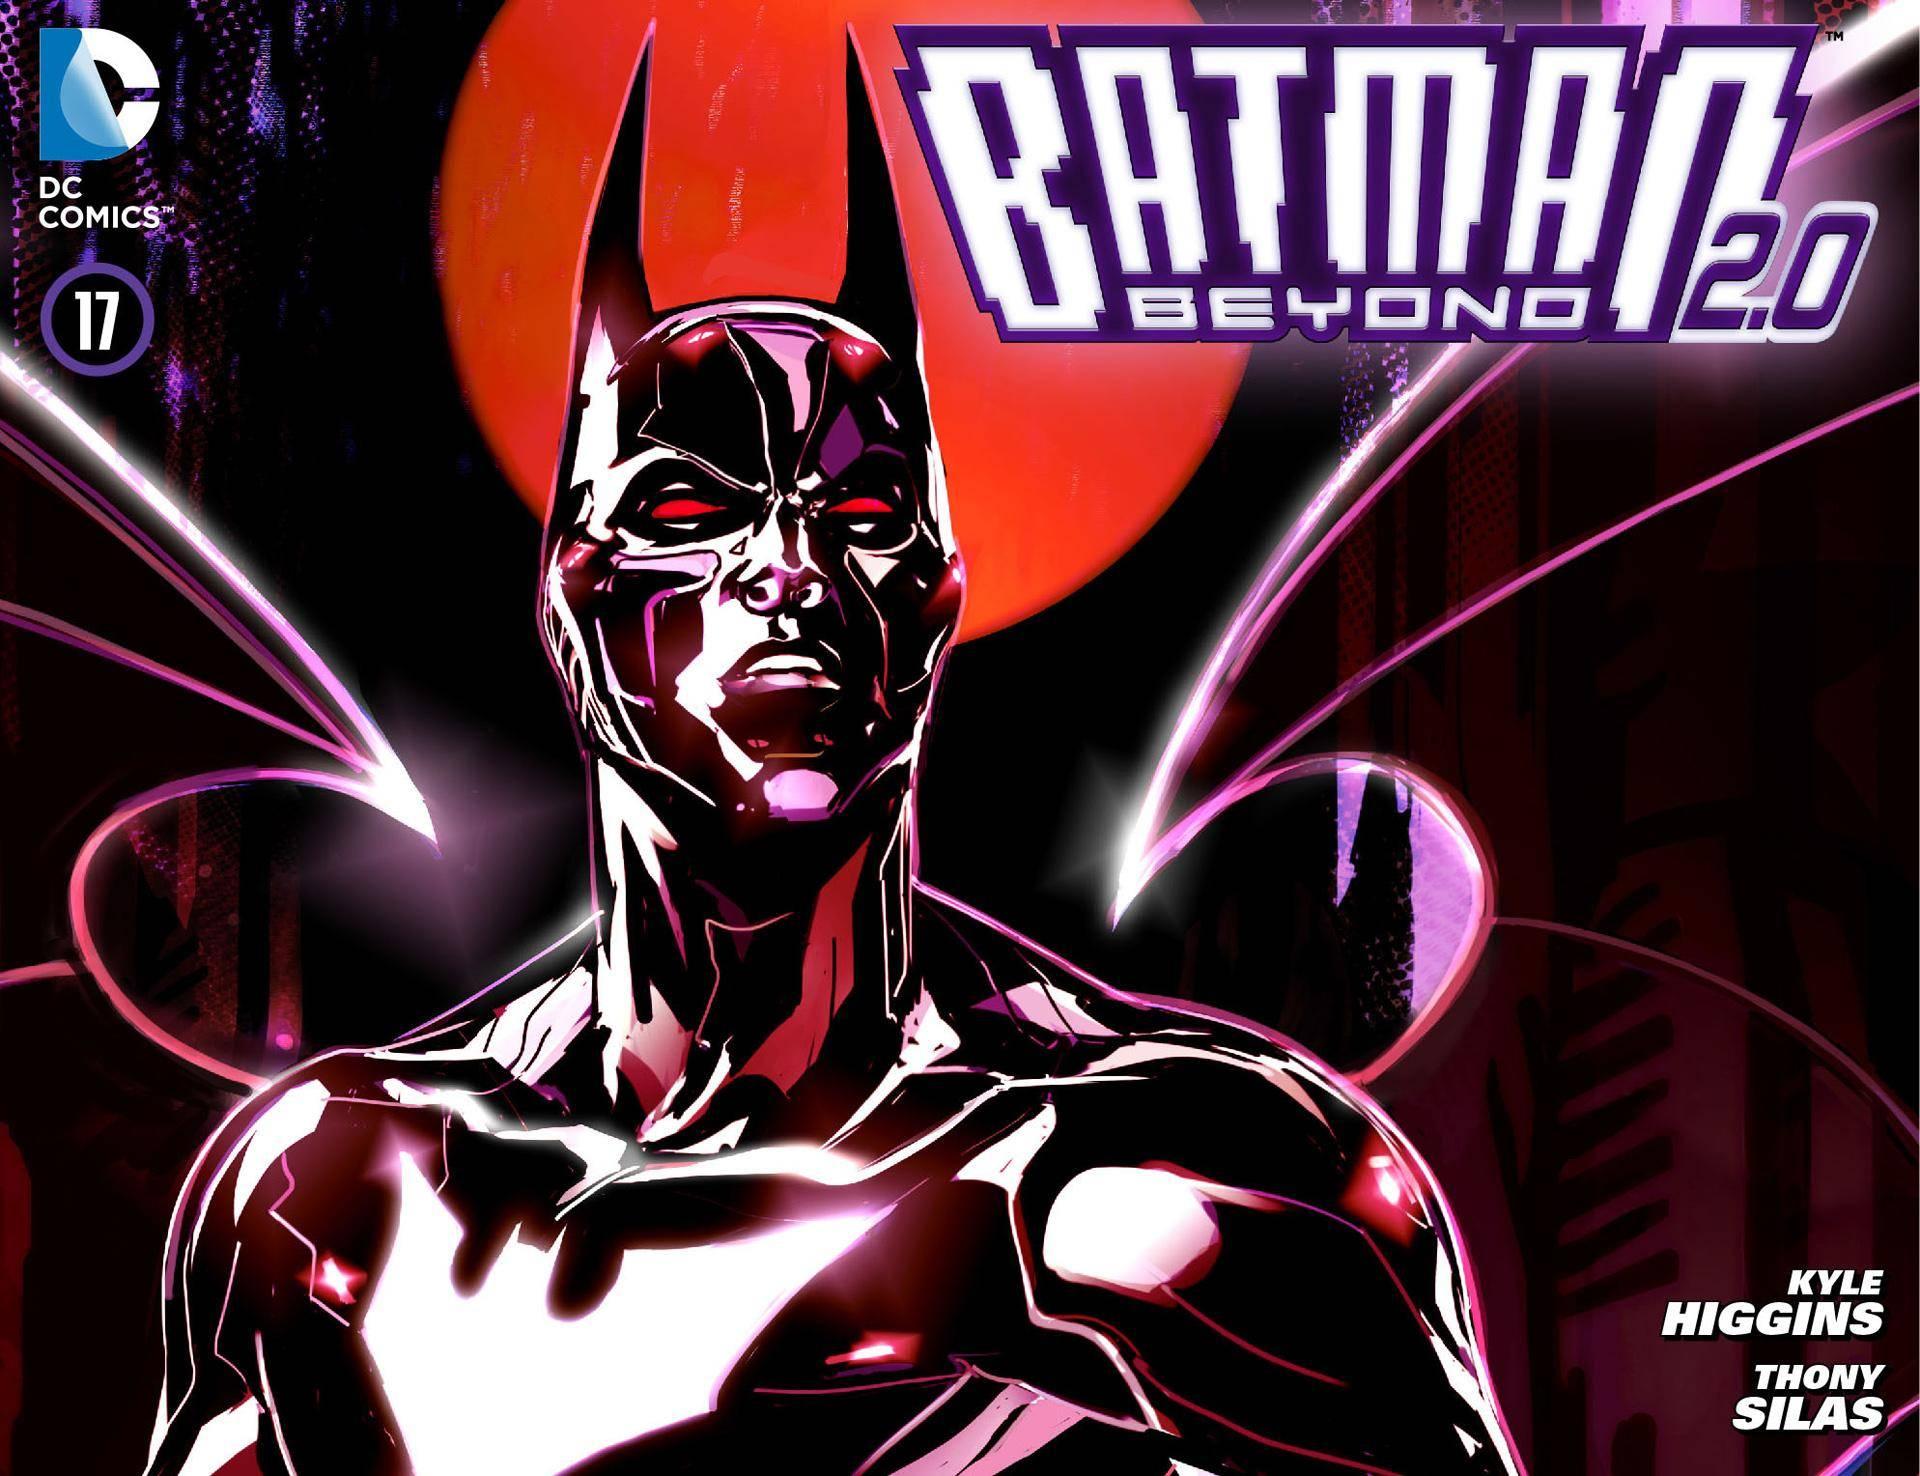 Batman Beyond 2 0 017 2014 digital